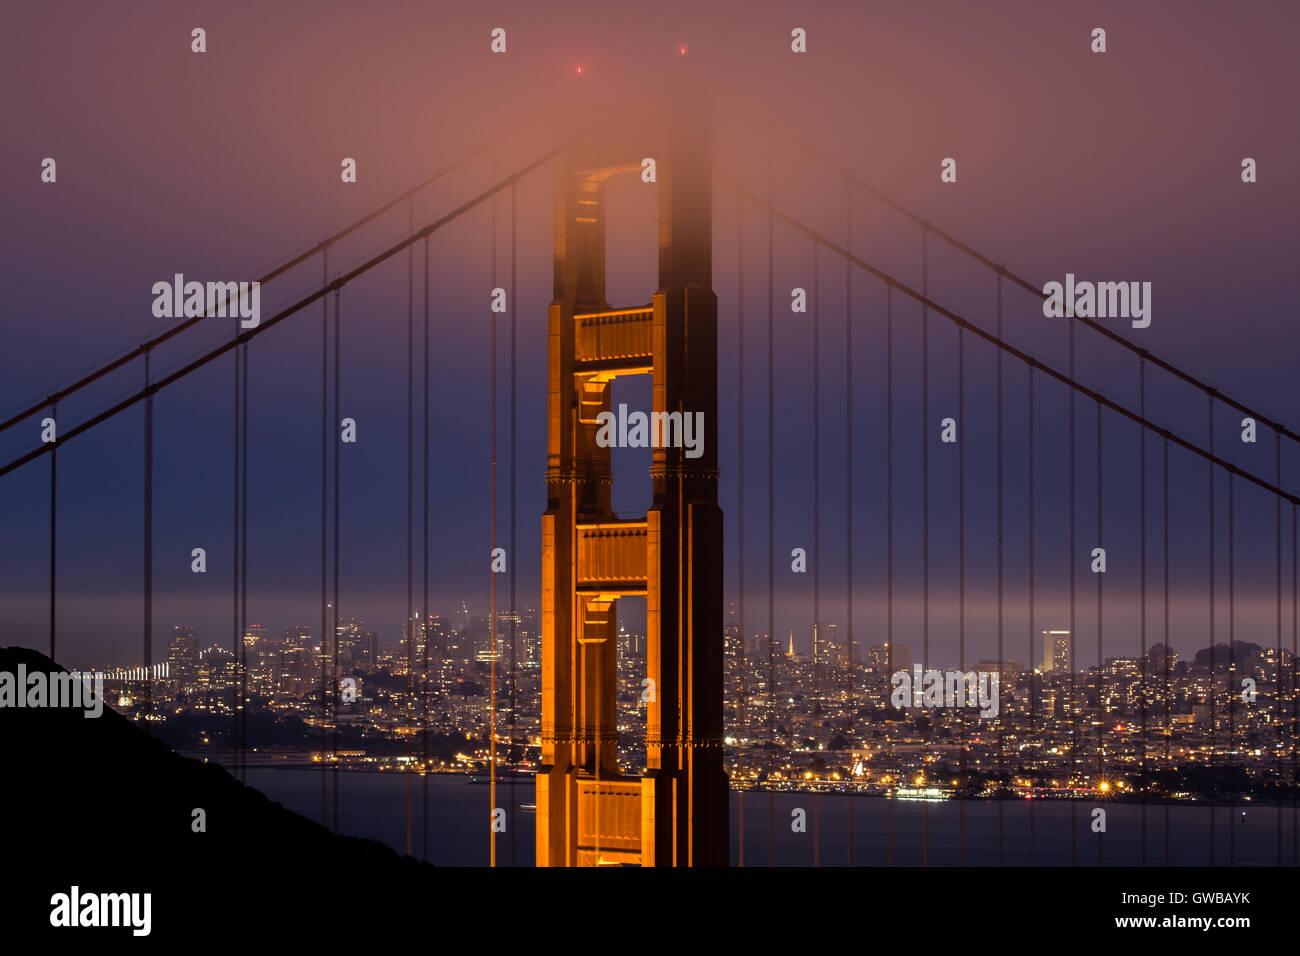 Puente Golden Gate de Kirby Cove, San Francisco, California, EE.UU. Foto de stock